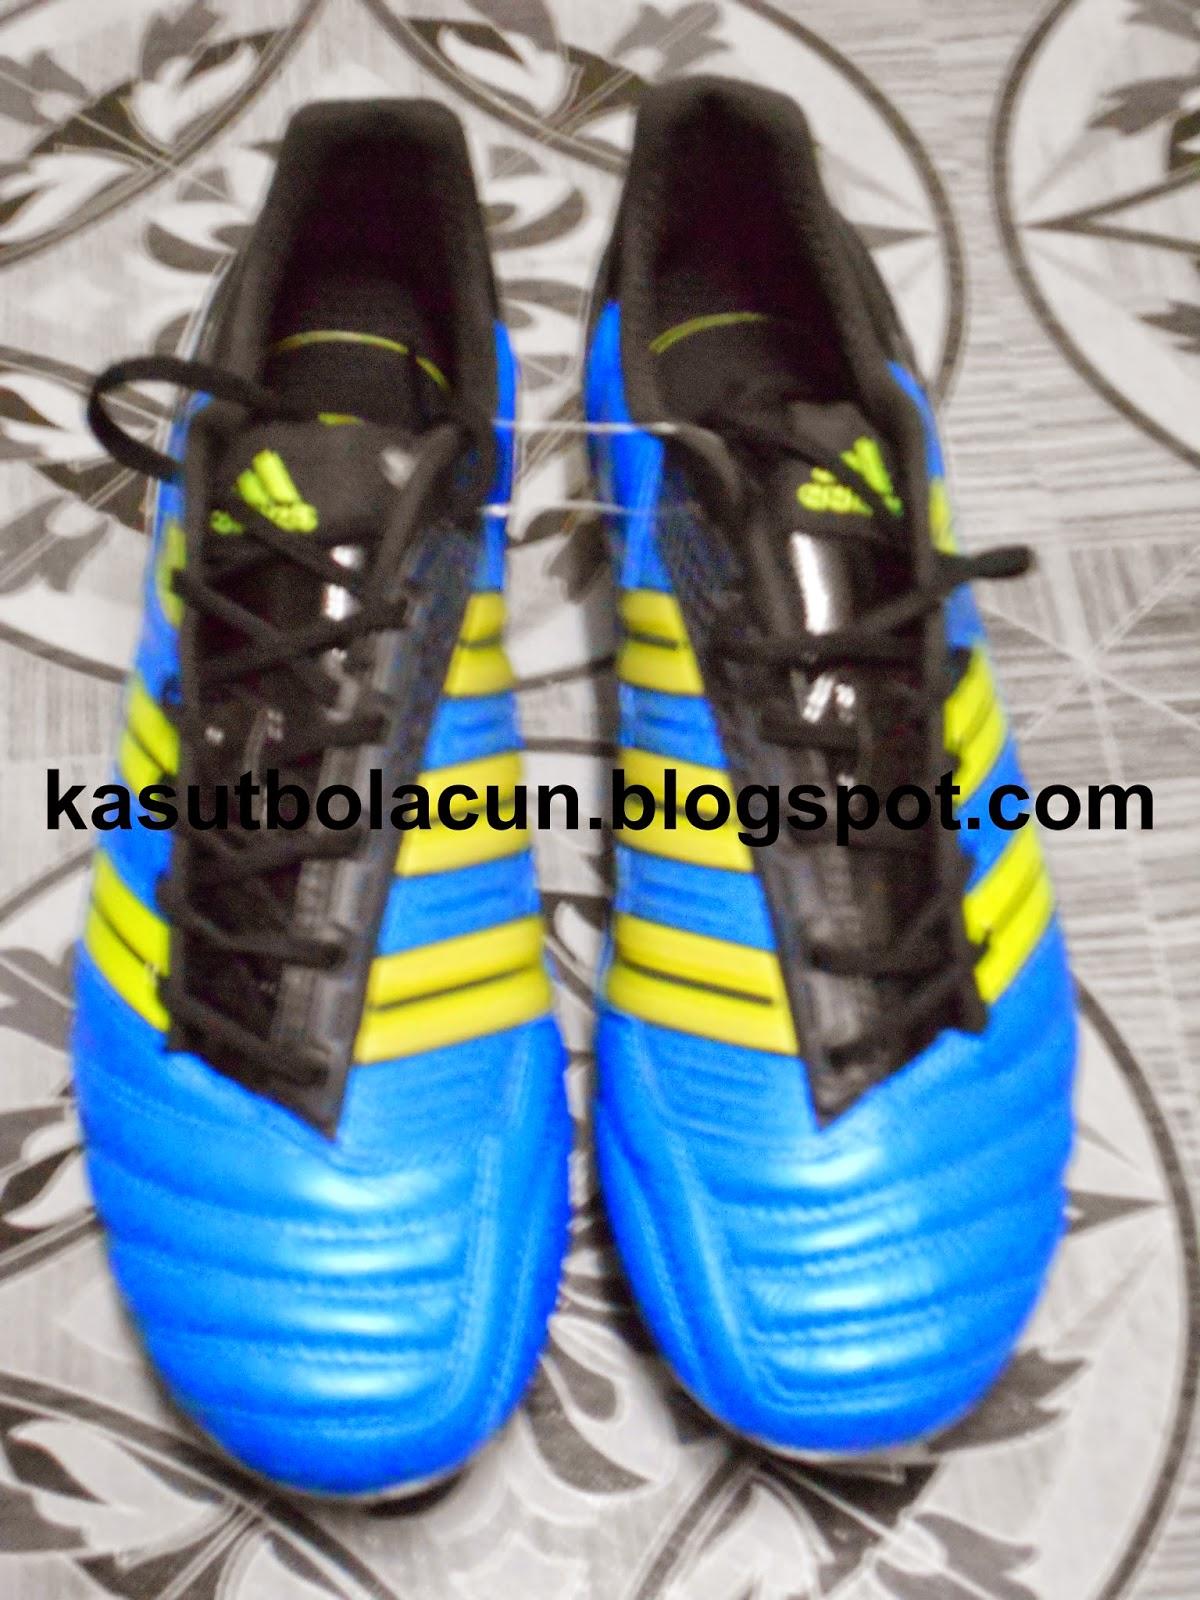 http://kasutbolacun.blogspot.com/2015/01/adidas-adipower-predator-fg-new.html